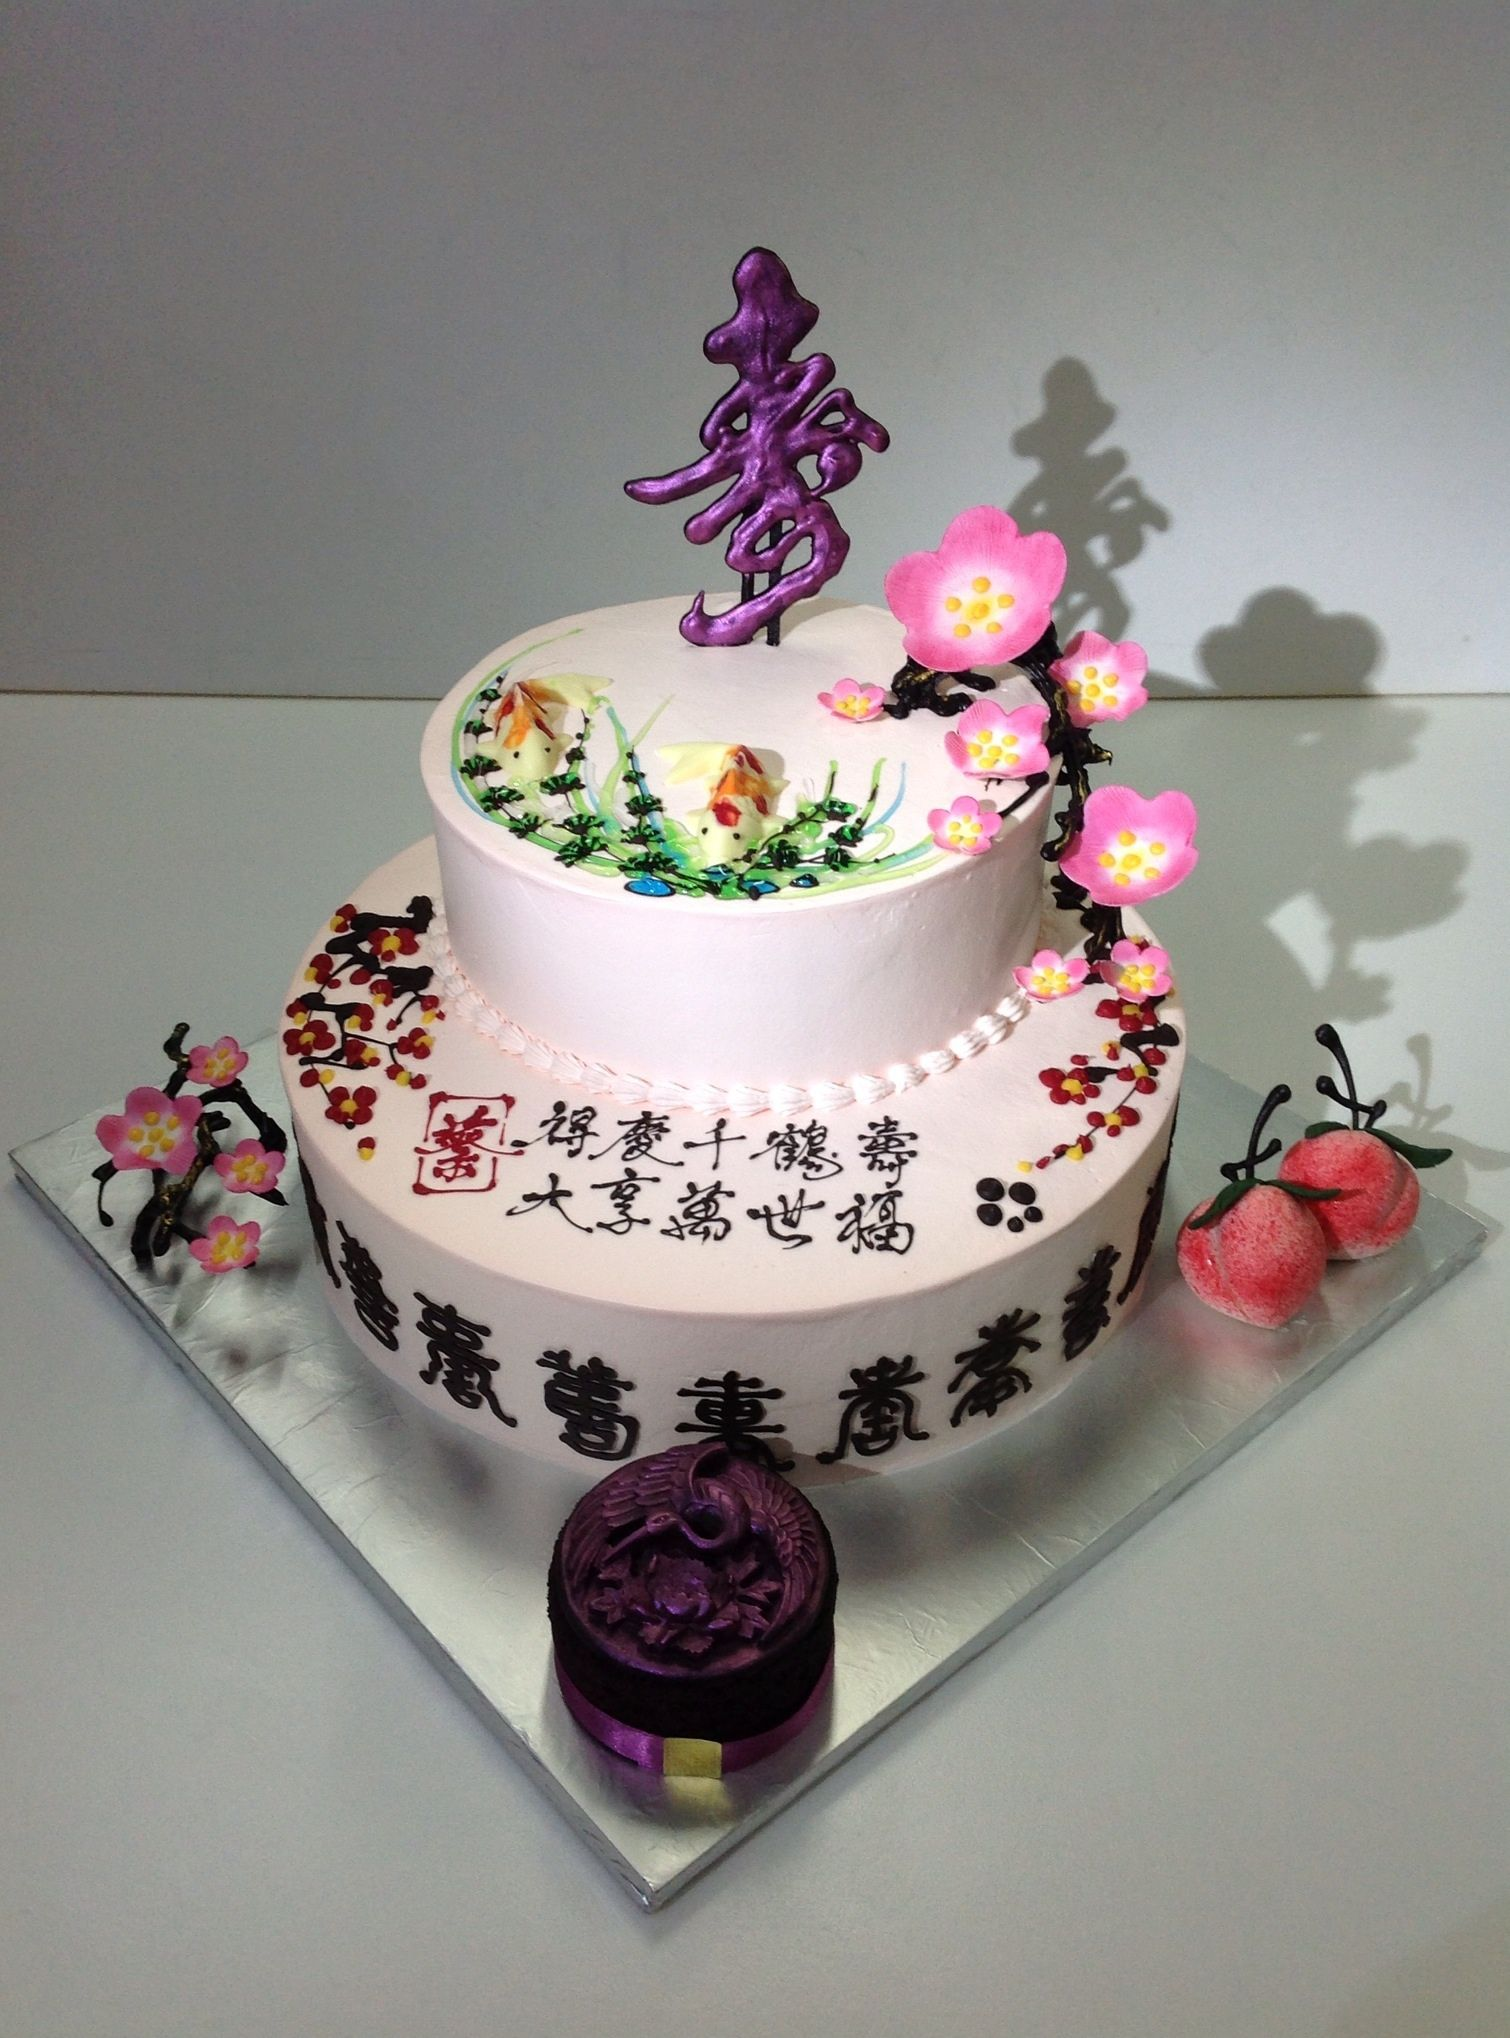 Chinese Birthday Cake With Cherry Blossom Chinese Style